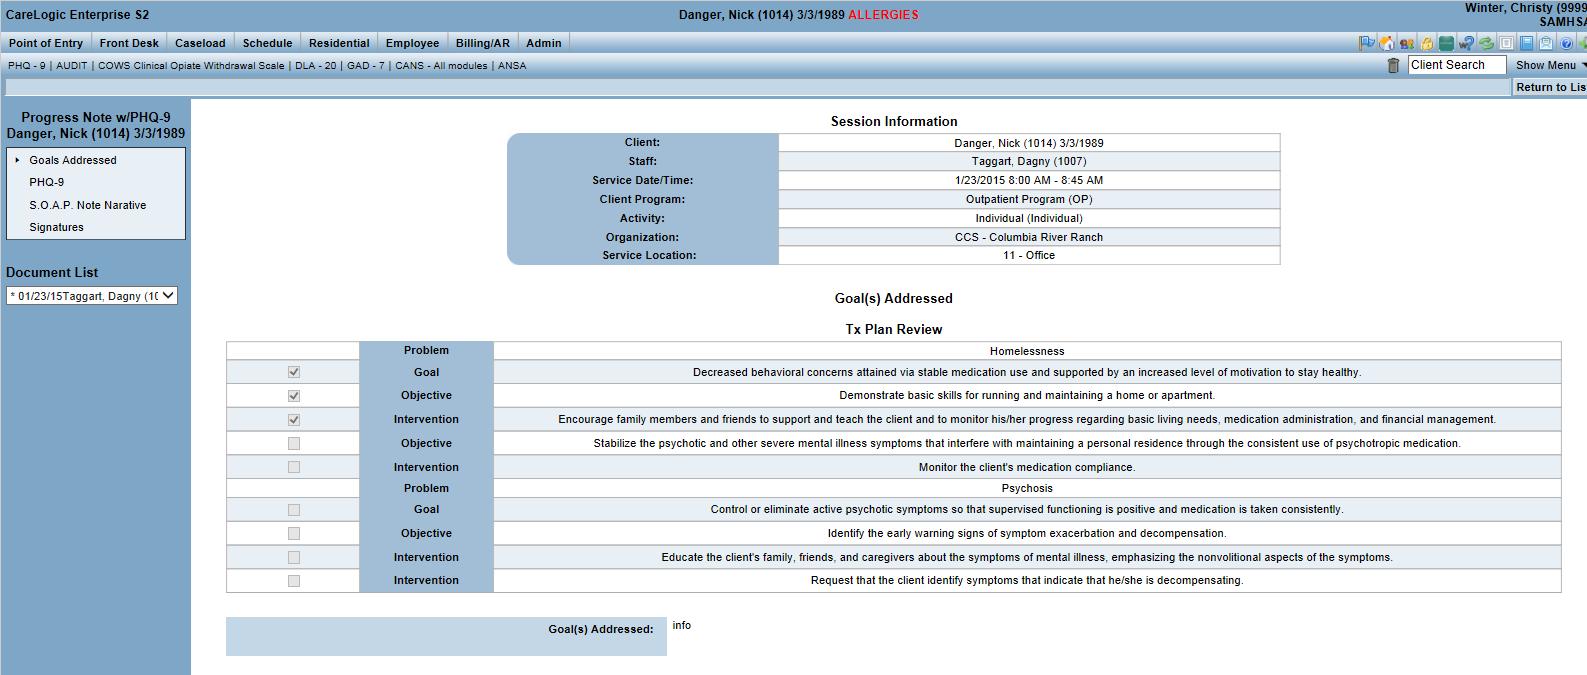 Qualifacts CareLogic Enterprise - CareLogic Enterprise - Qualifacts progress notes